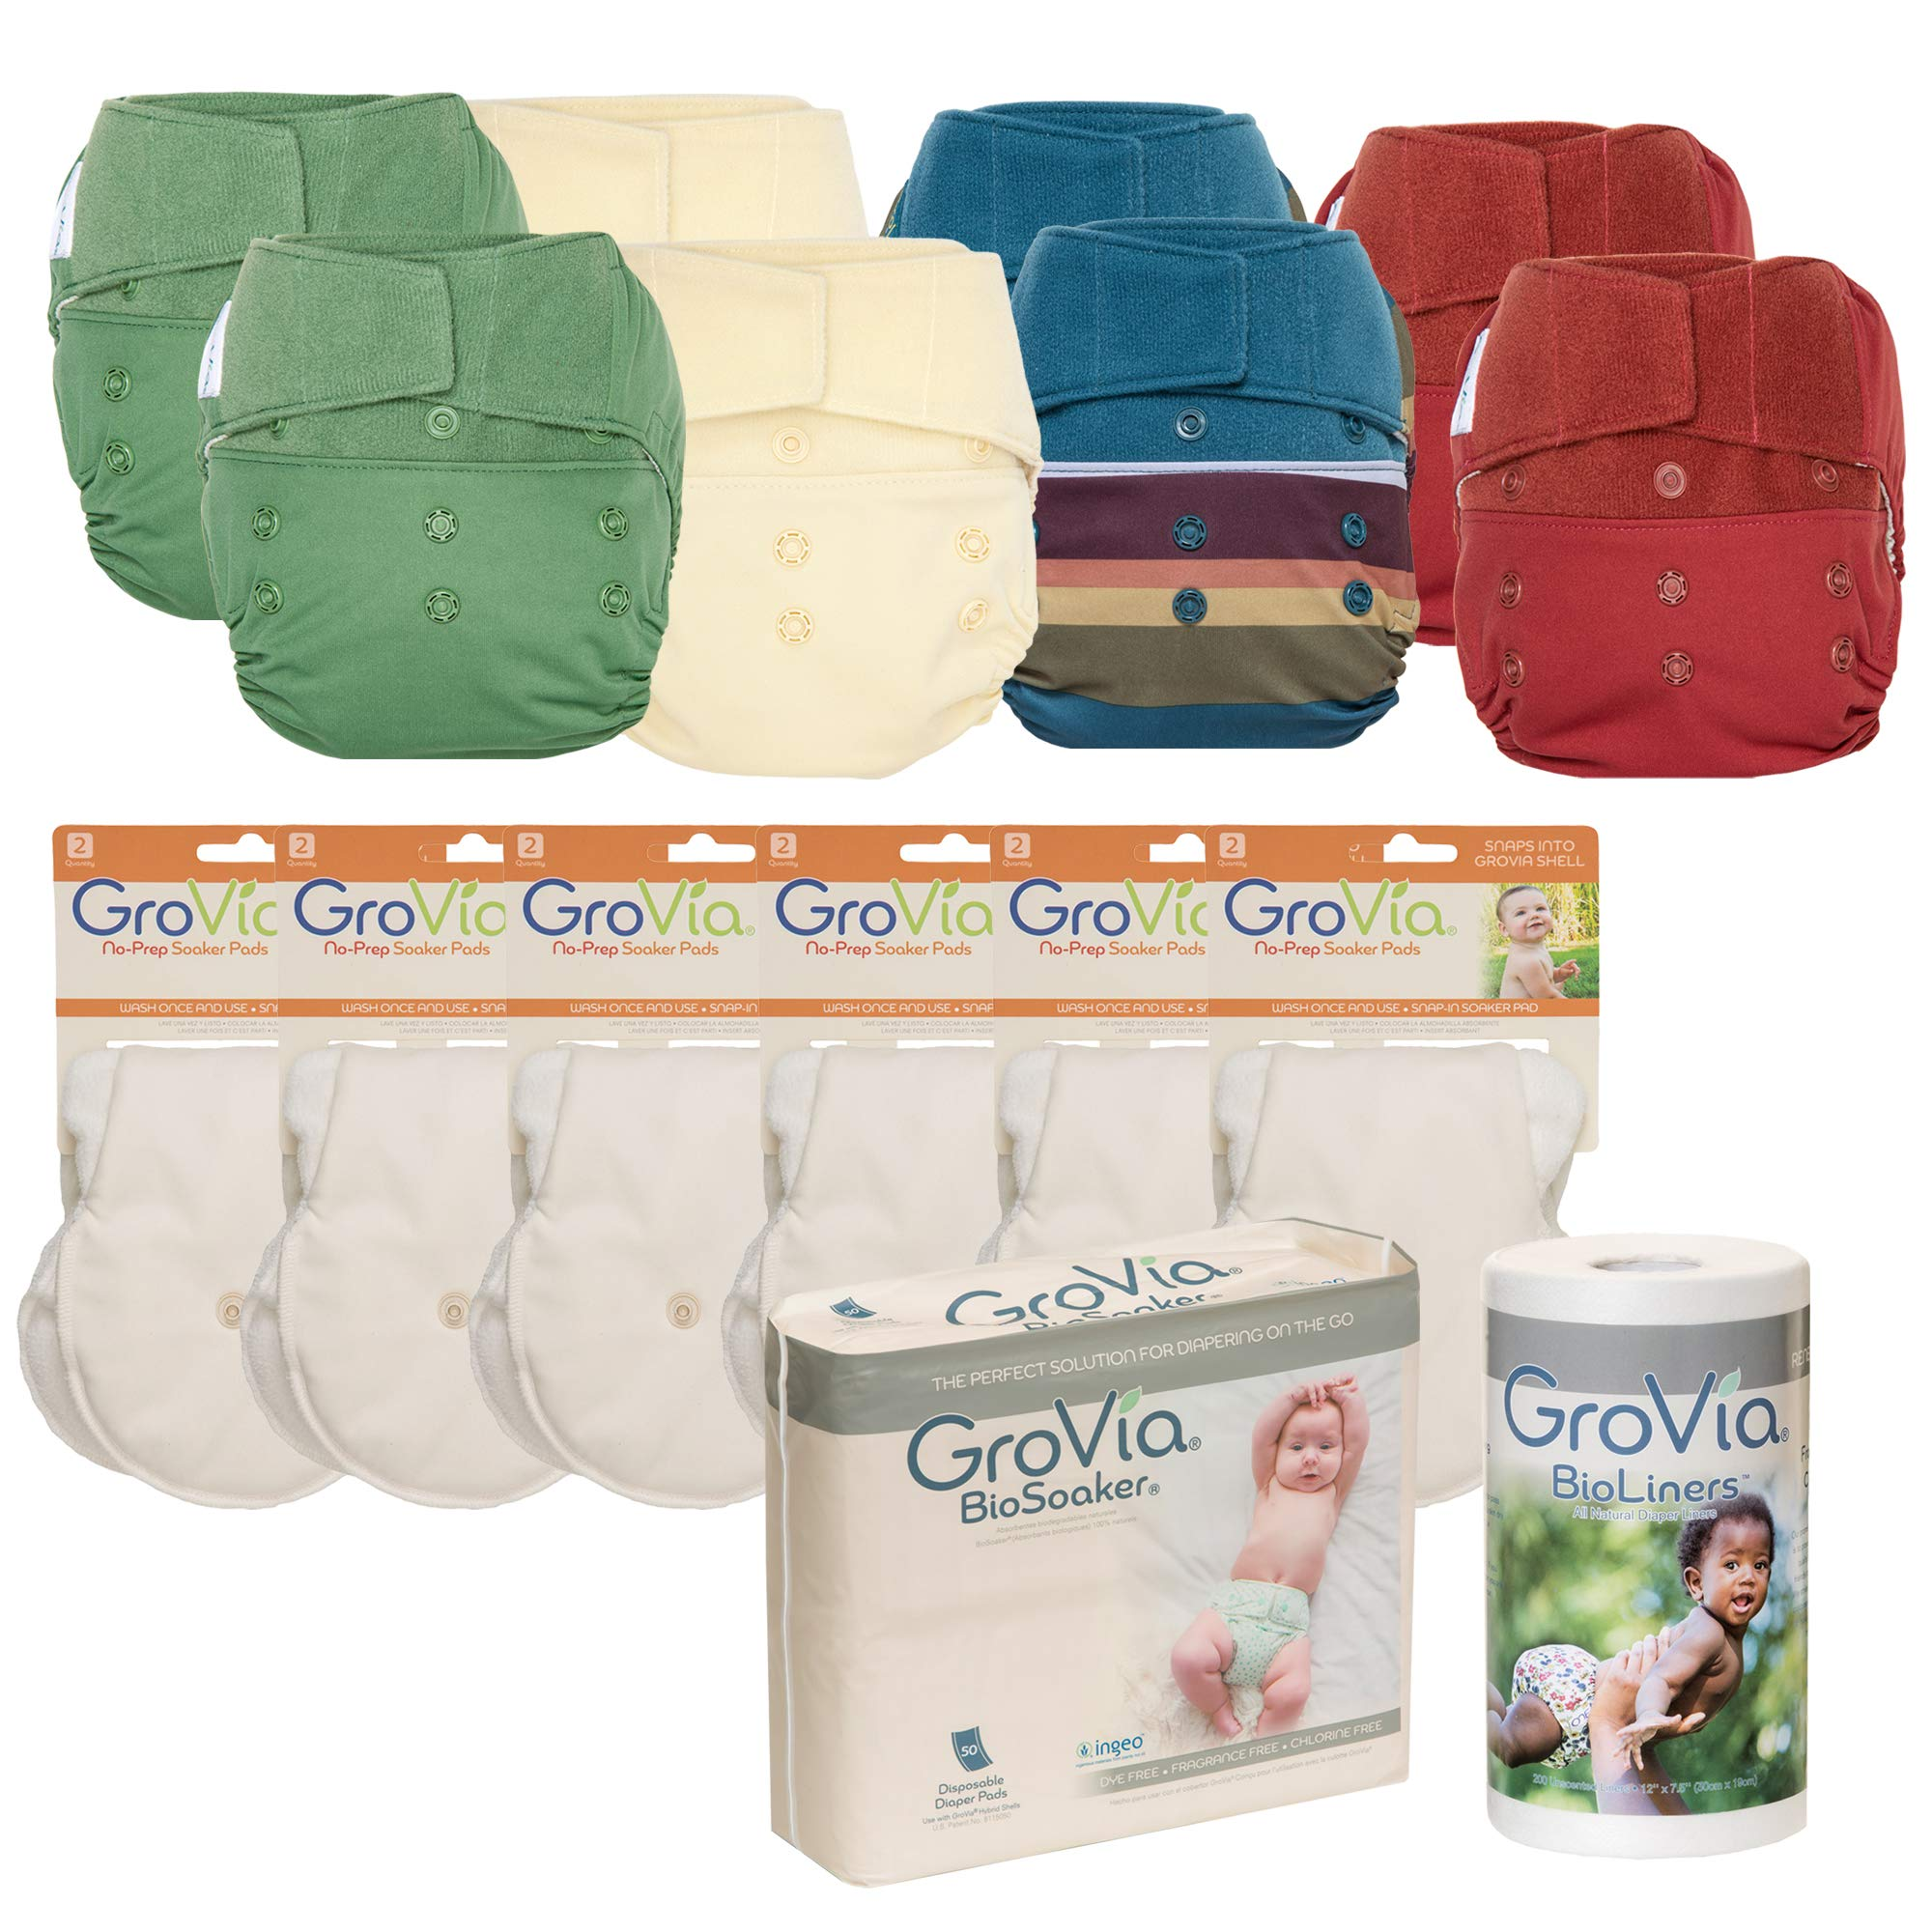 GroVia - Cloth Diaper Bundle for Natural Parenting – (8) Reusable Hybrid Diaper Shells – (1) BioSoaker Secure Eco Friendly Adhesive Inserts 50pk – (1) Unscented BioLiner 200ct – (6) No Prep Soaker Pad